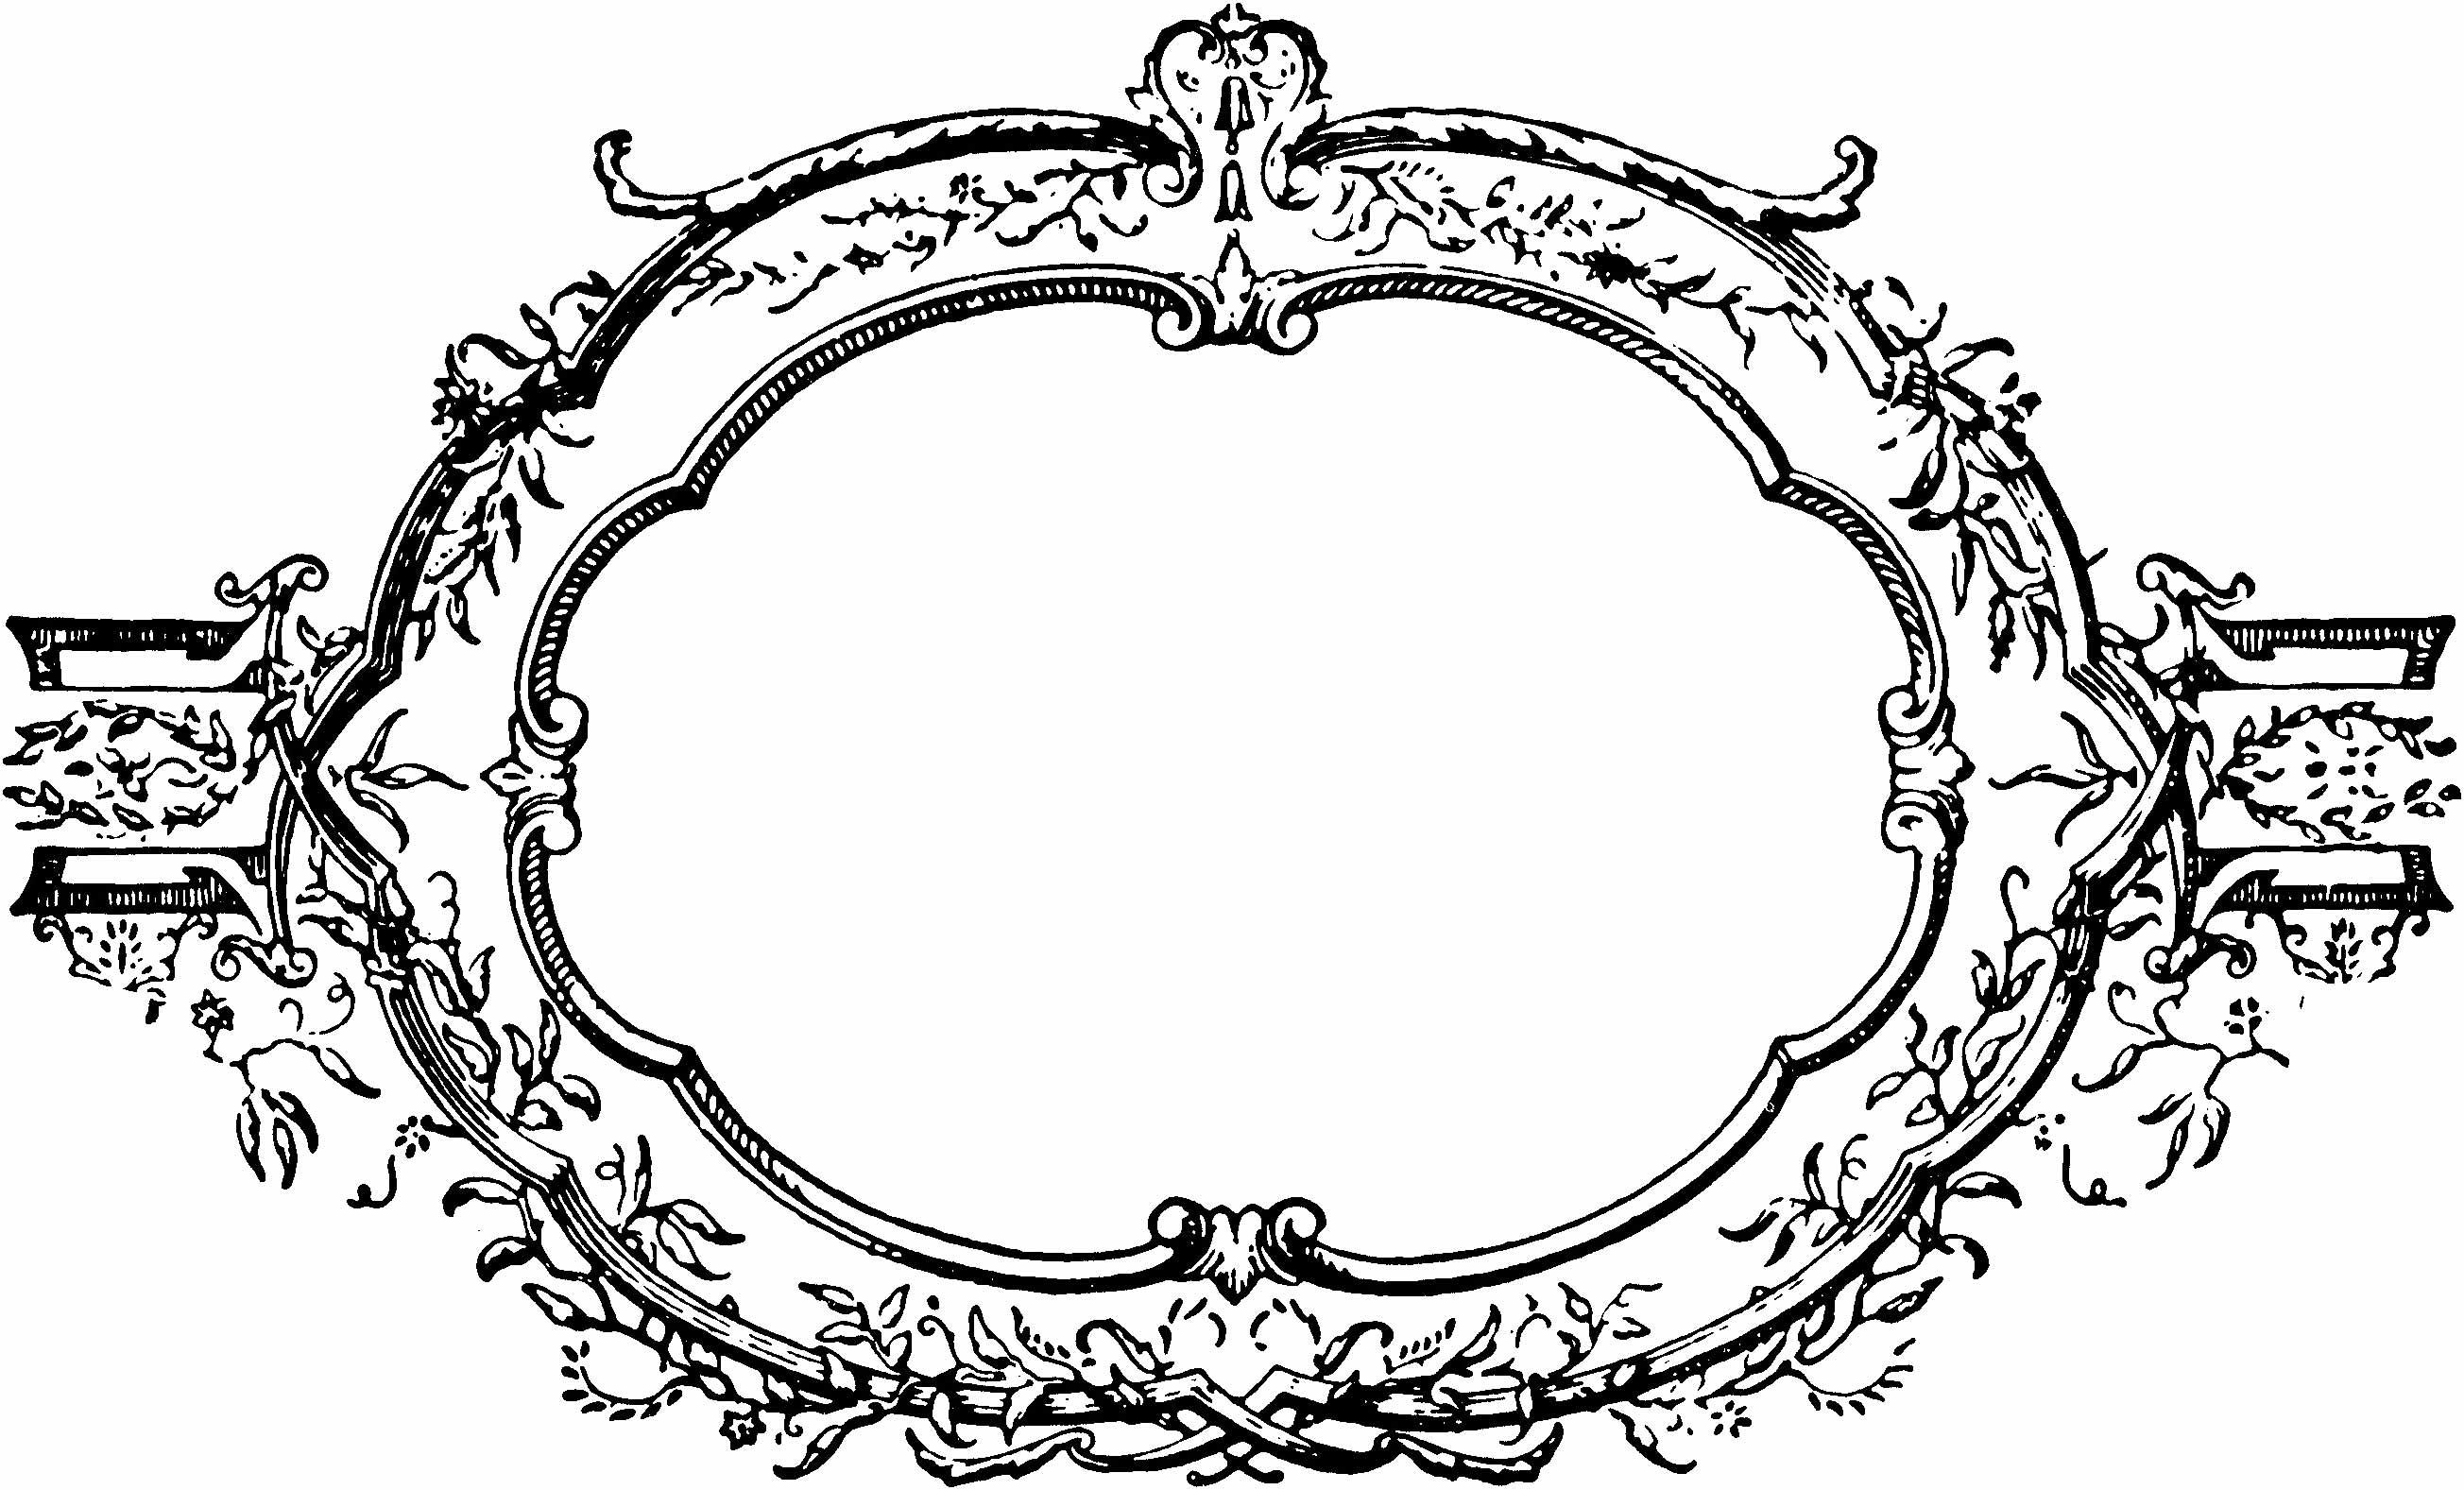 free clip art vintage decorative frame laurel wreath oh so rh vintagegraphics ohsonifty com decorative oval frame clipart decorative circle frame clipart